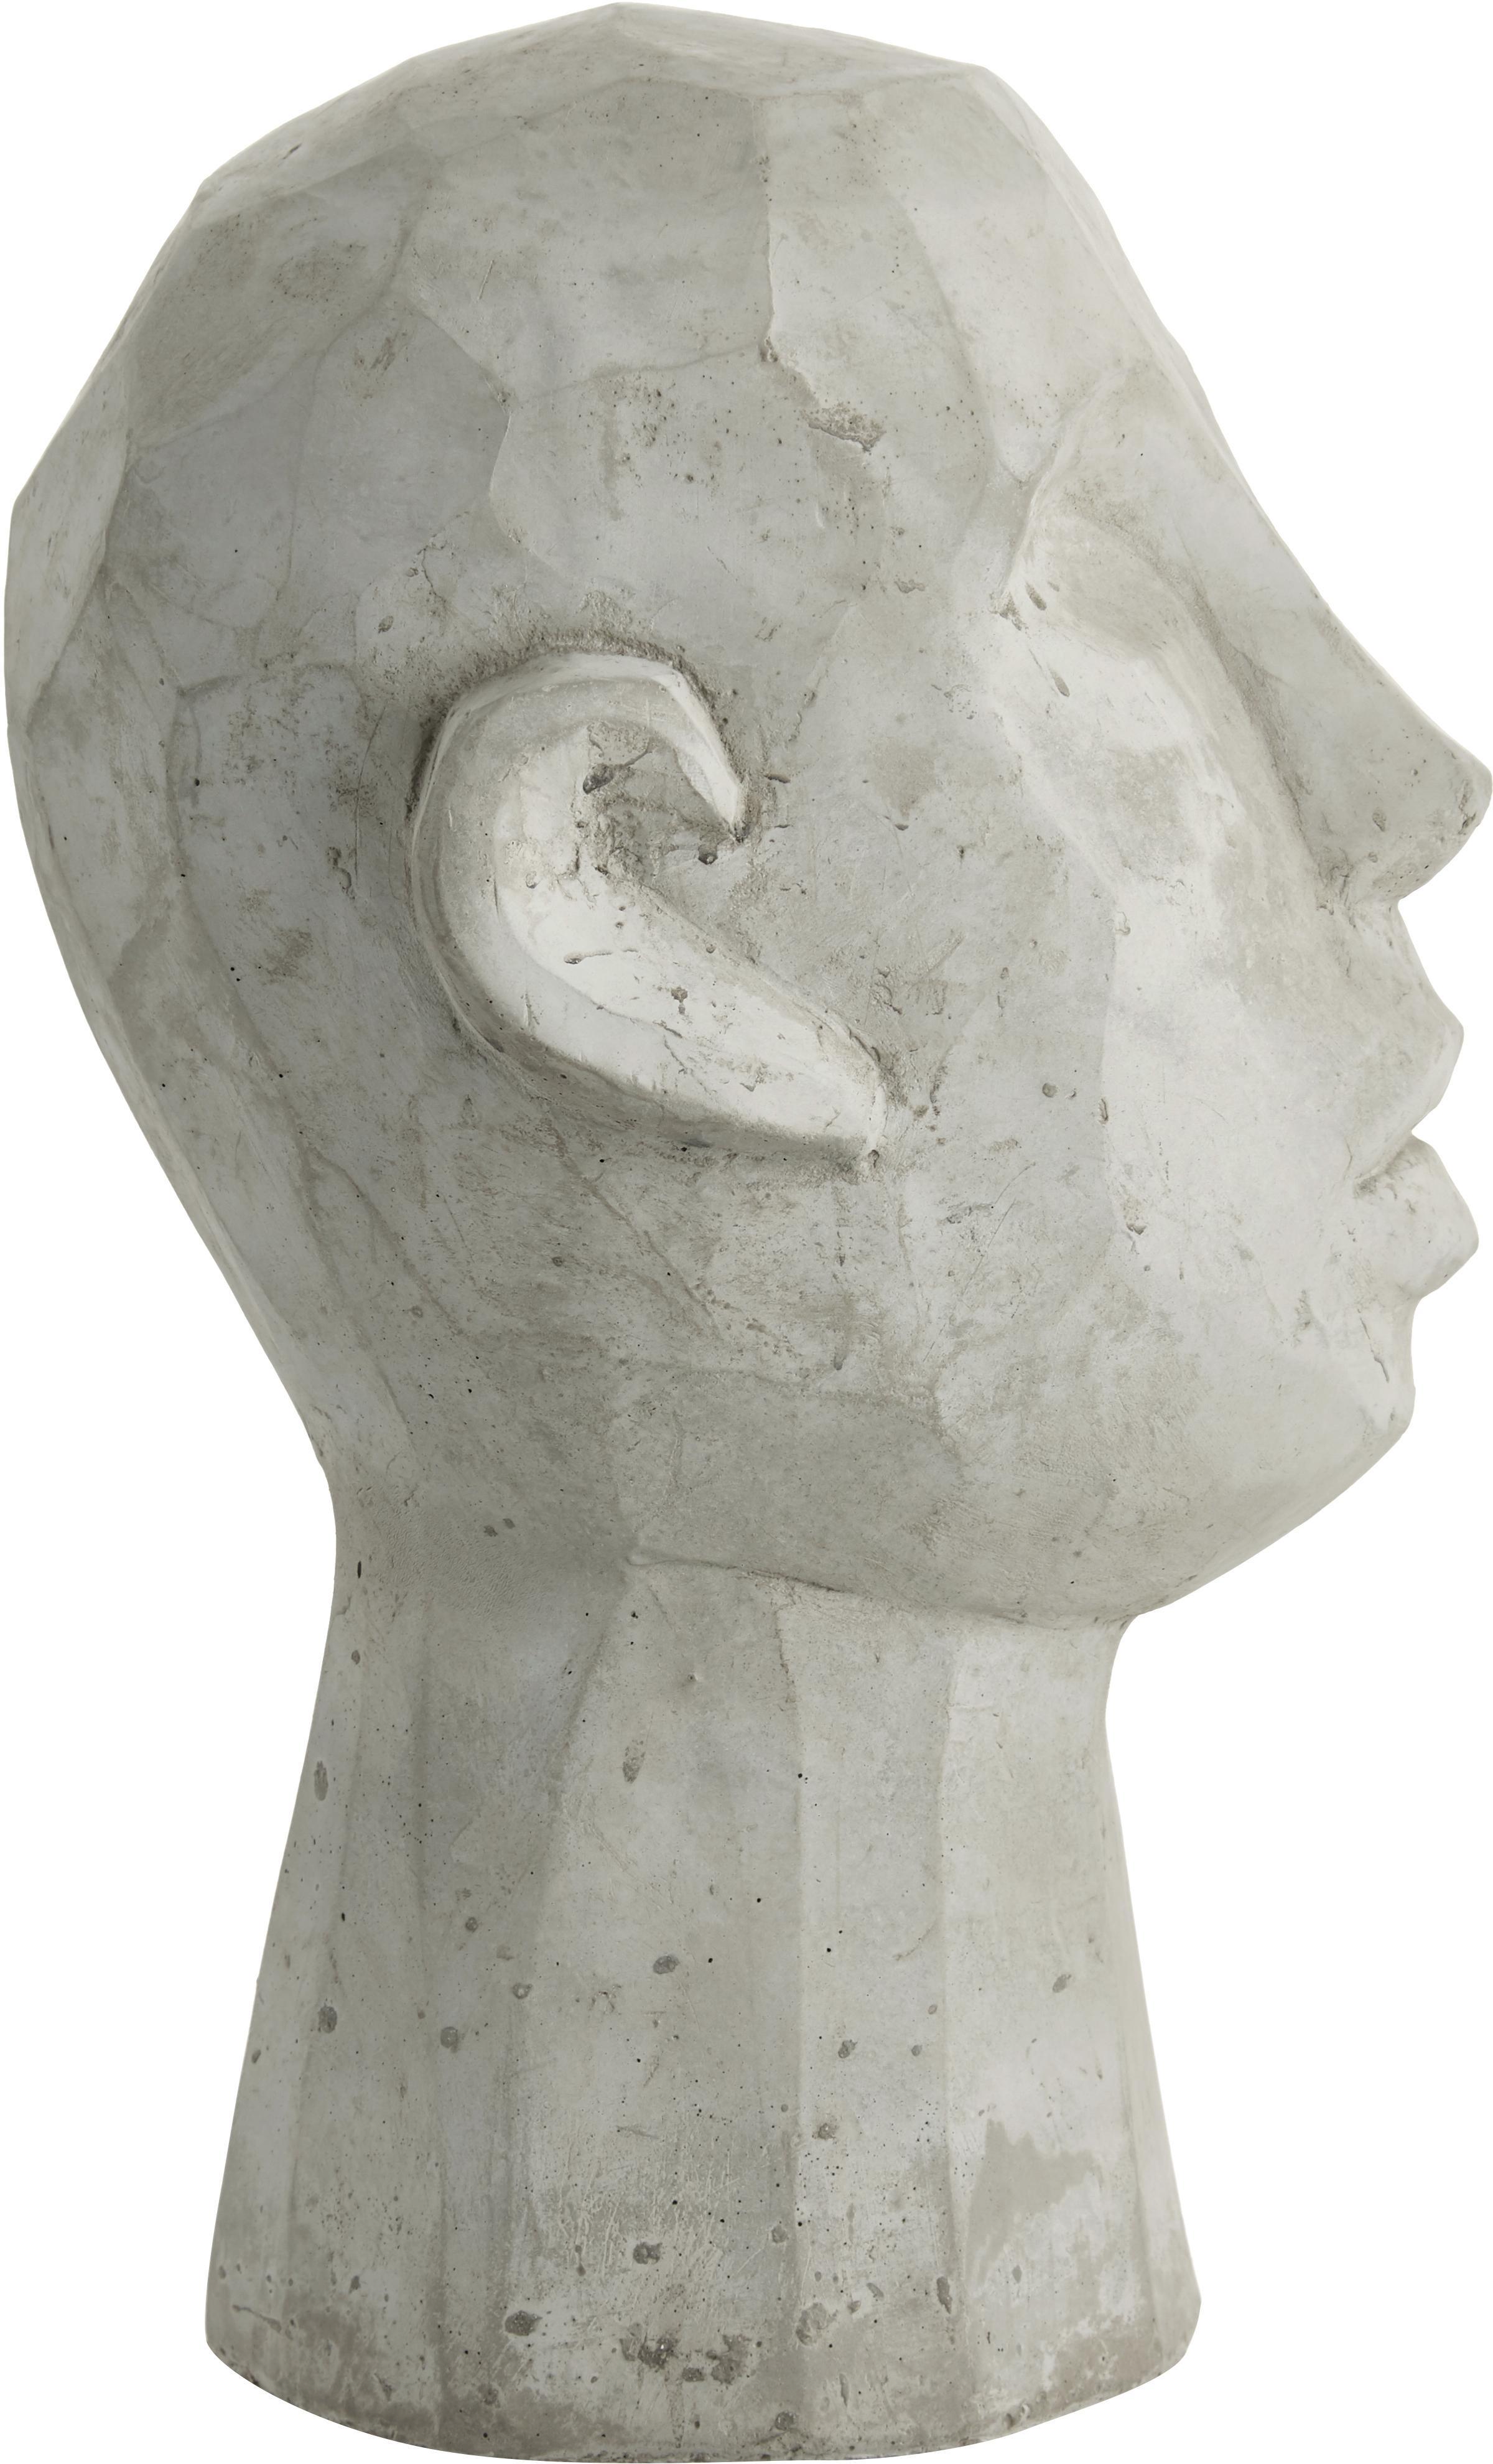 Figura decorativa Kopf, Cemento, Gris, An 20 x Al 30 cm